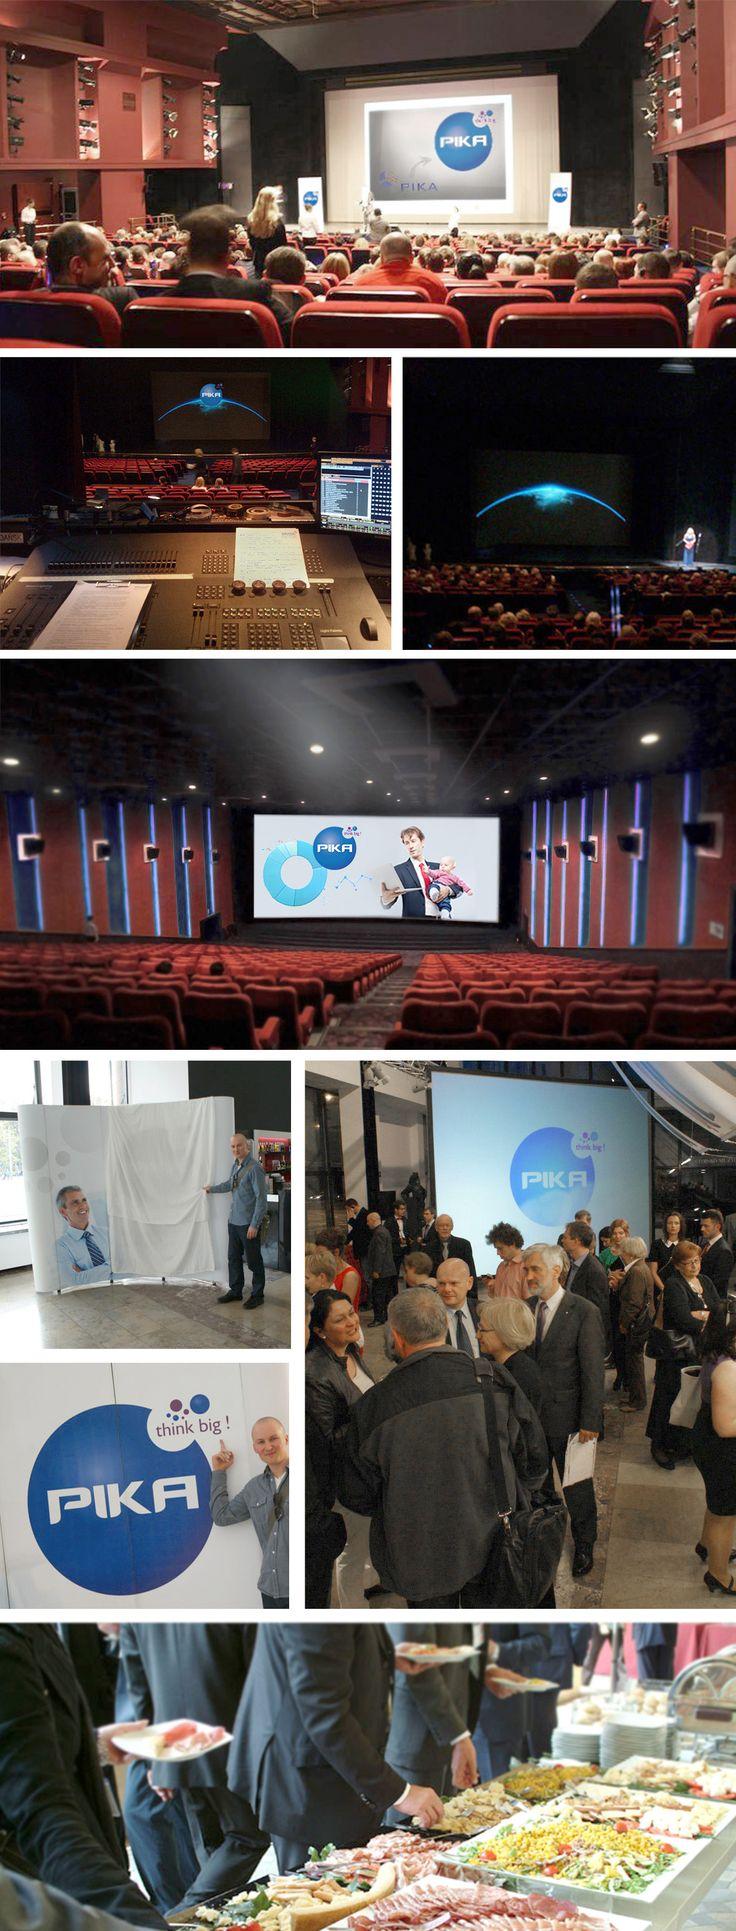 #pika  #gdansk  #event  #baltic  #opera  #baltycka  #rocznica  #corporate  #ci  #logo  #anniversary  #advertising  #agencja #brandfactor #agency #projekty #logo #projektowanie #design #marketing